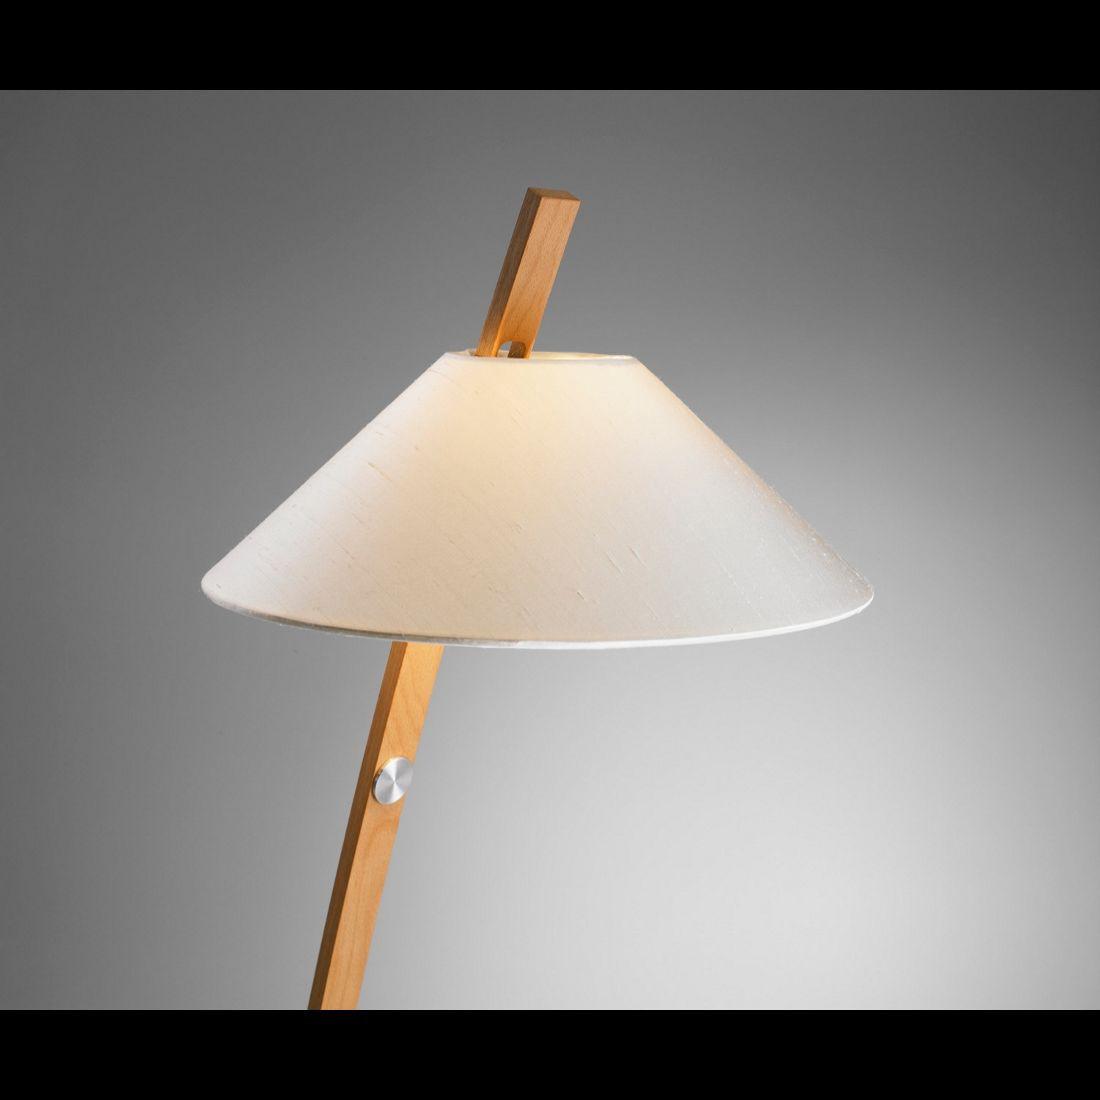 Leseleuchte Bow - Maron - Schirm: Leder Schwarz, Domus